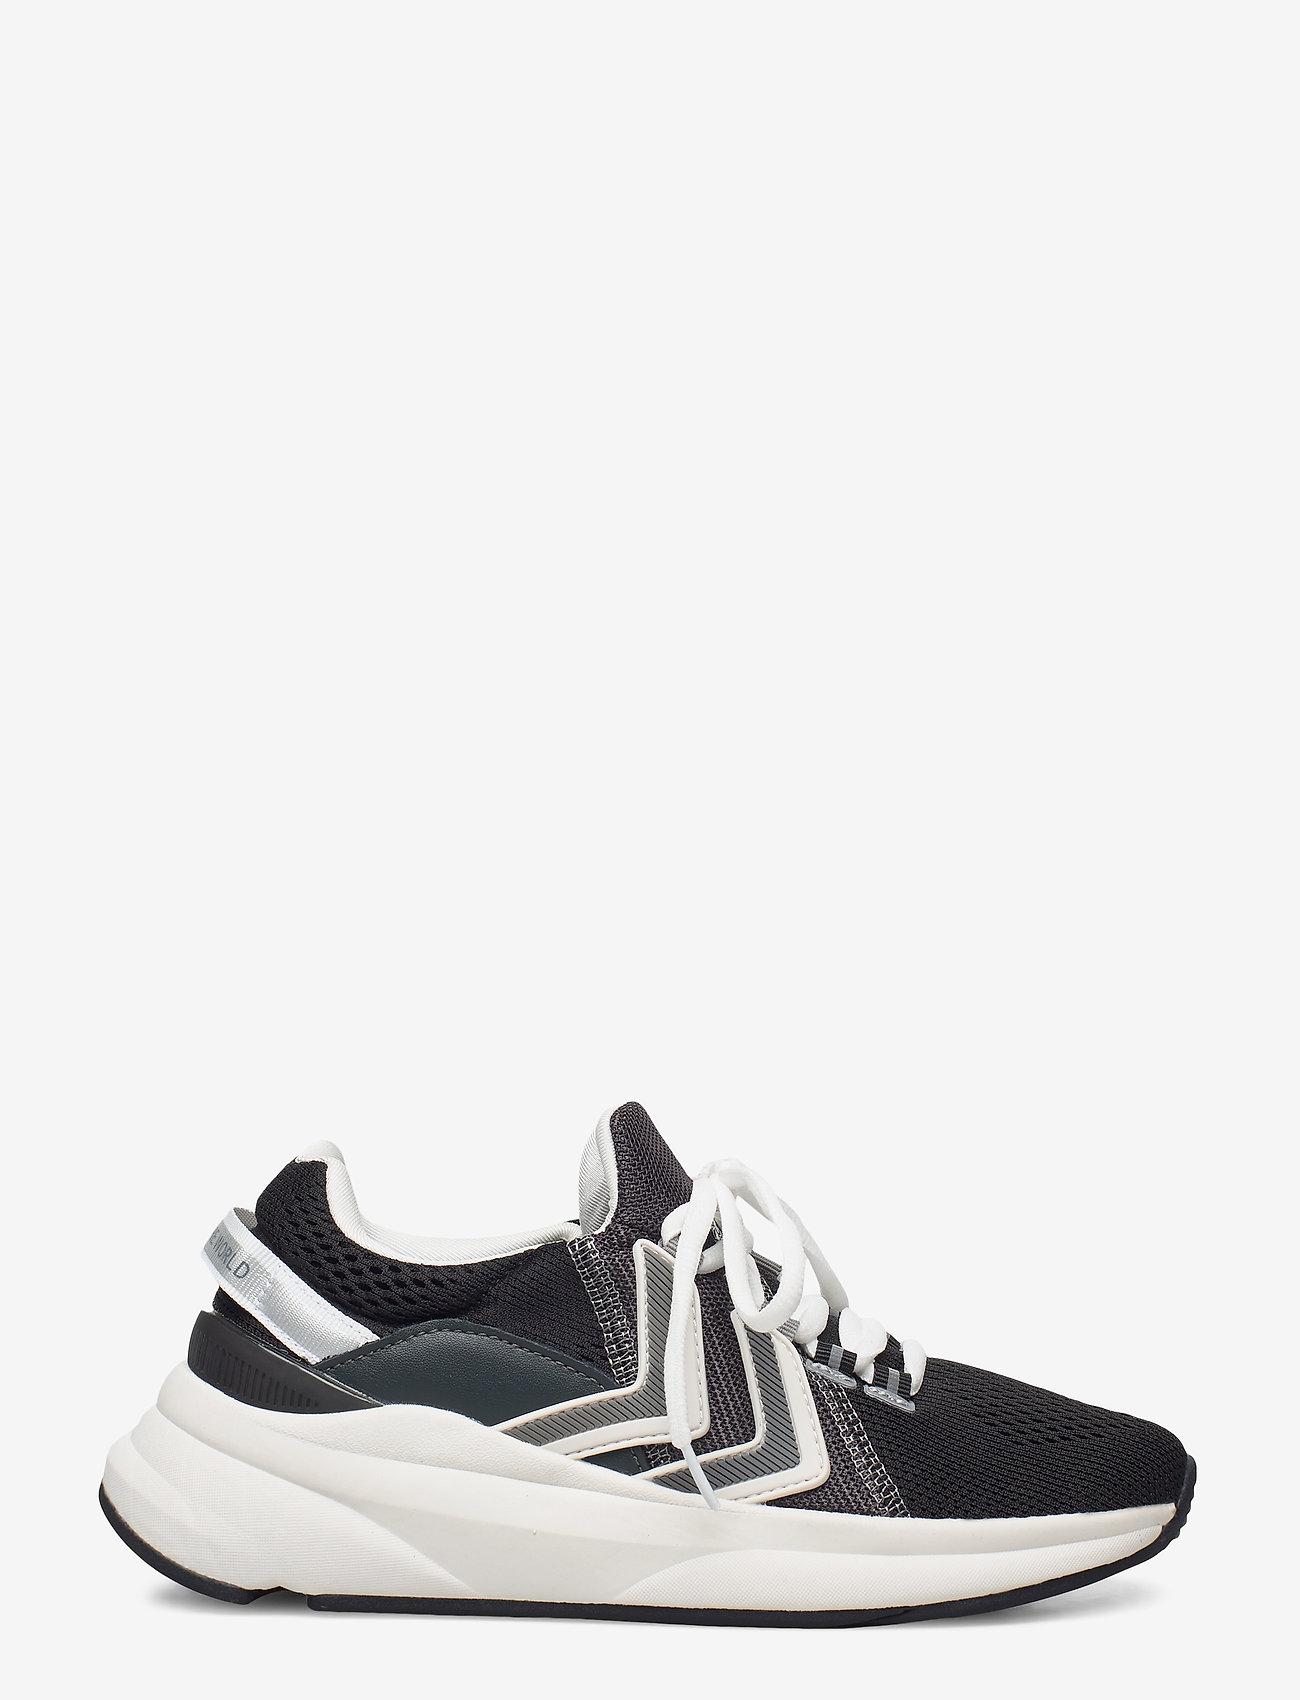 Hummel - REACH LX 300 - laag sneakers - black - 0